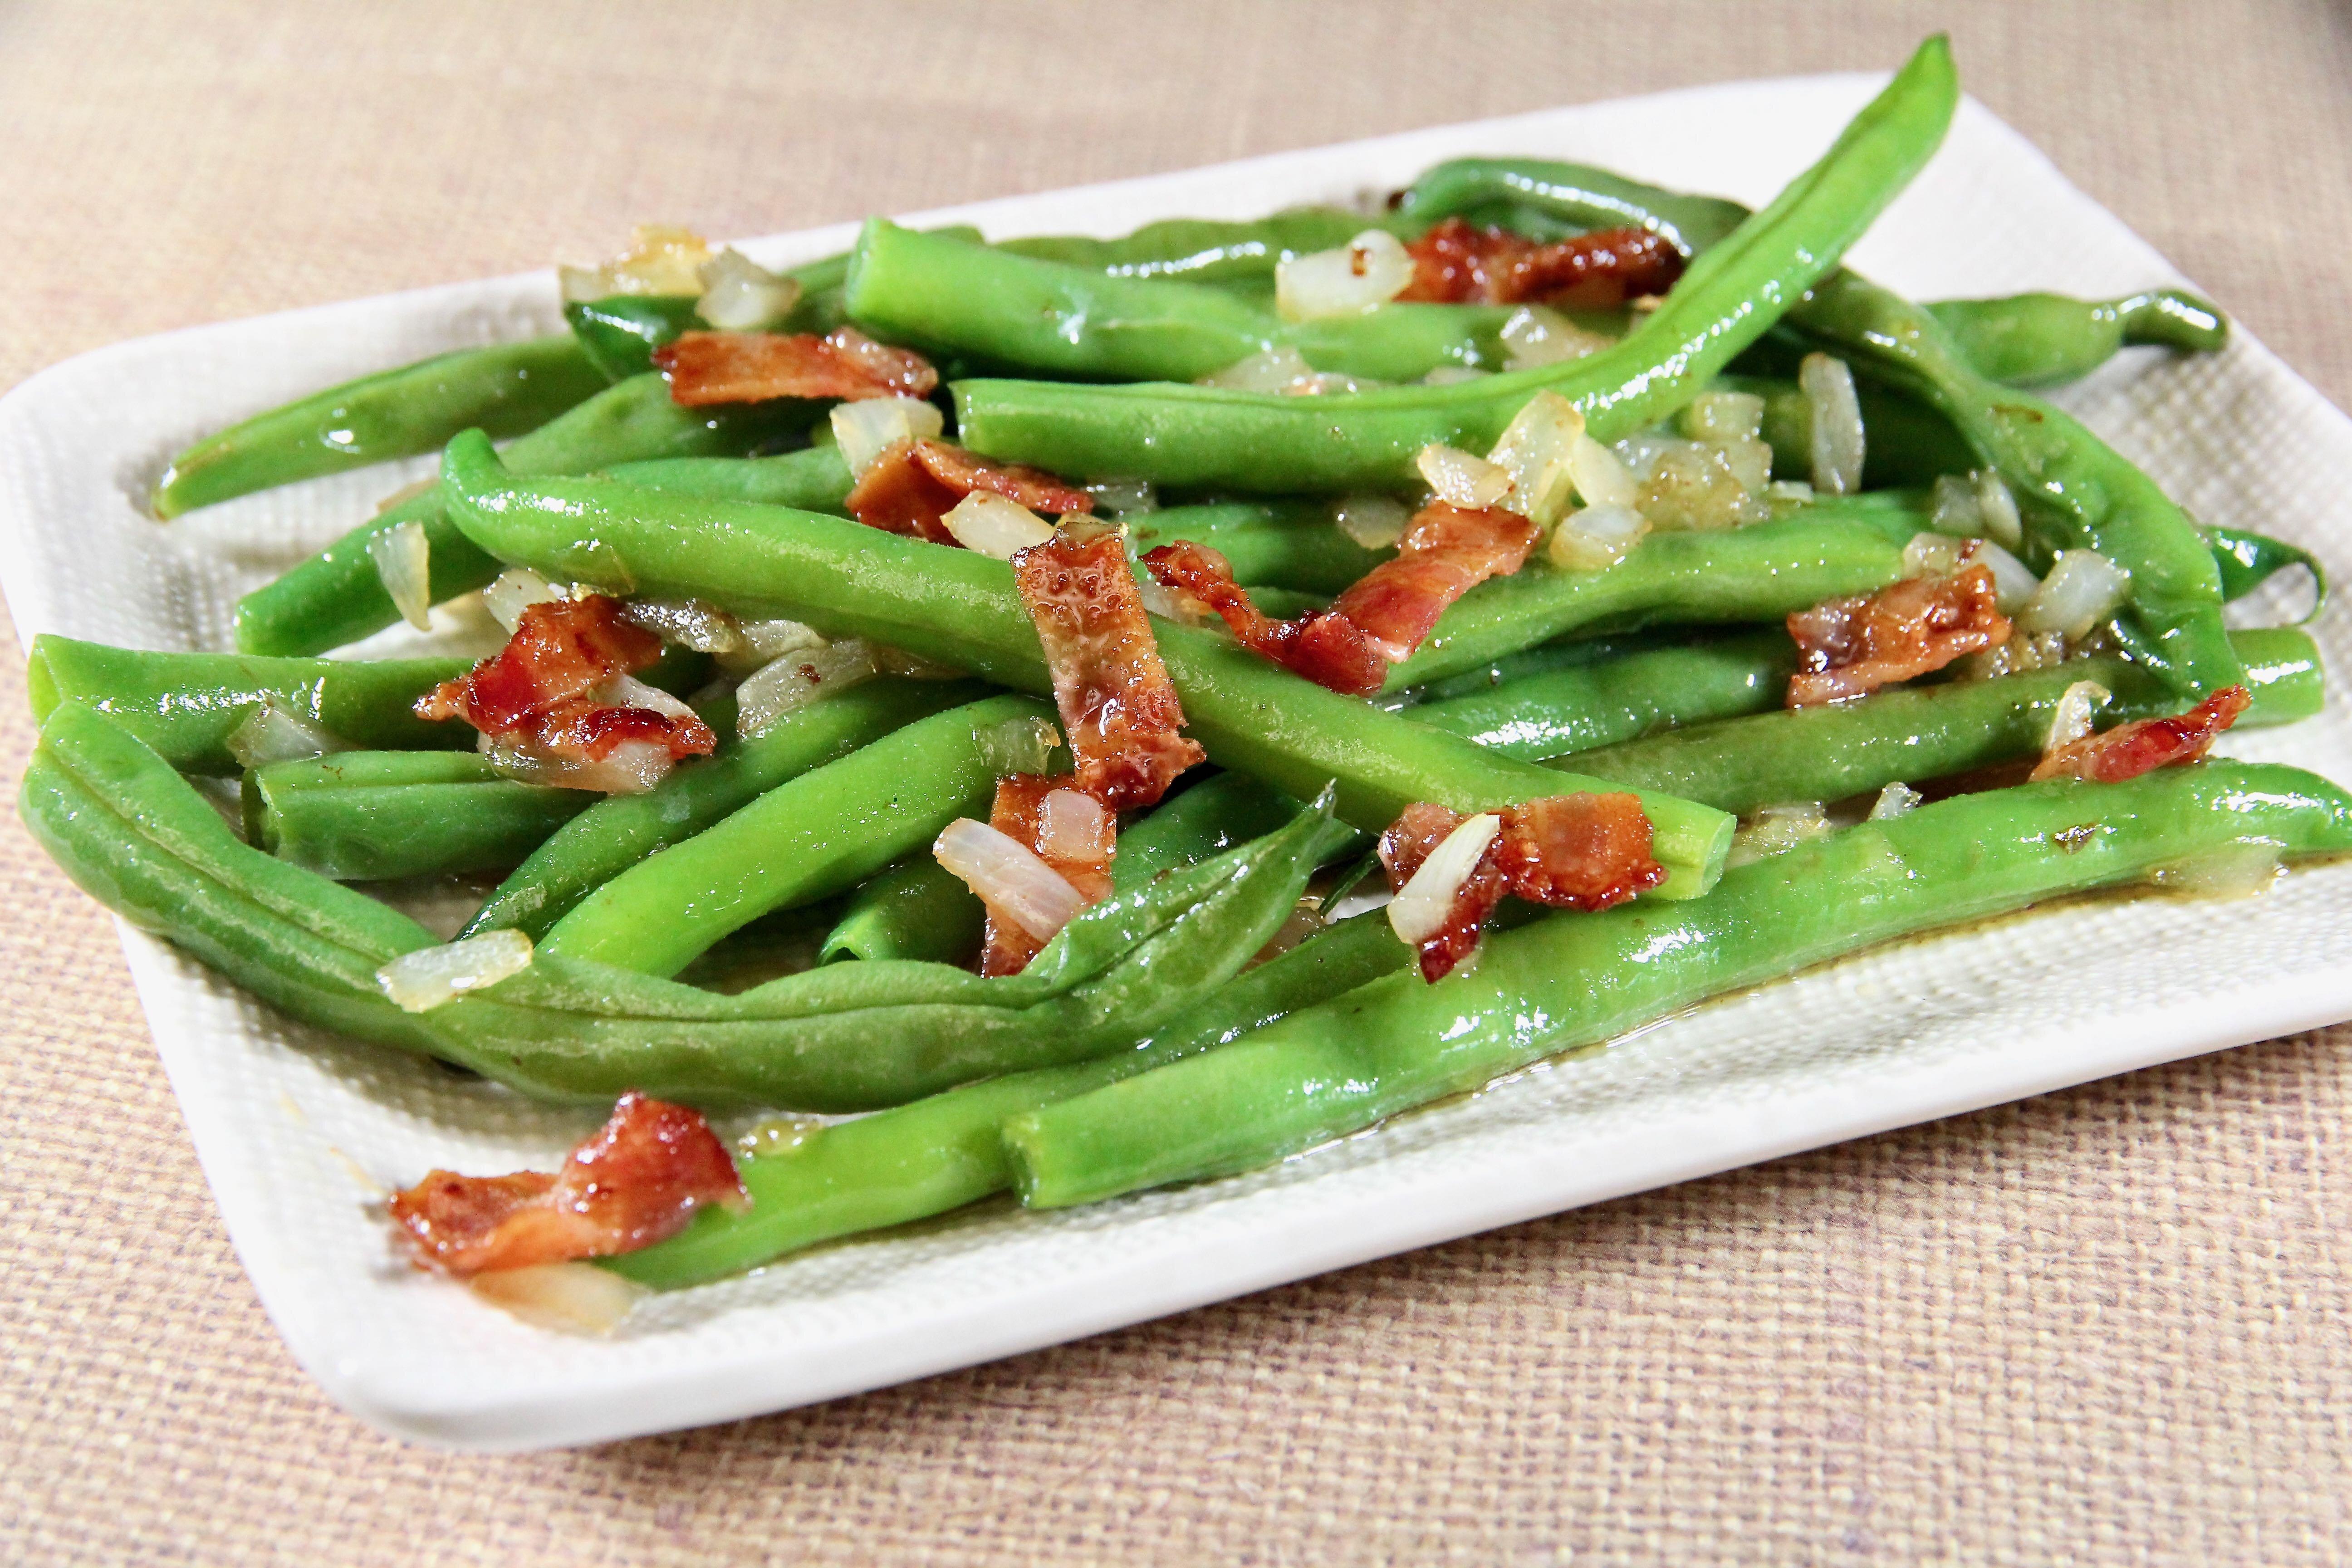 grandmas green beans with bacon vinaigrette recipe